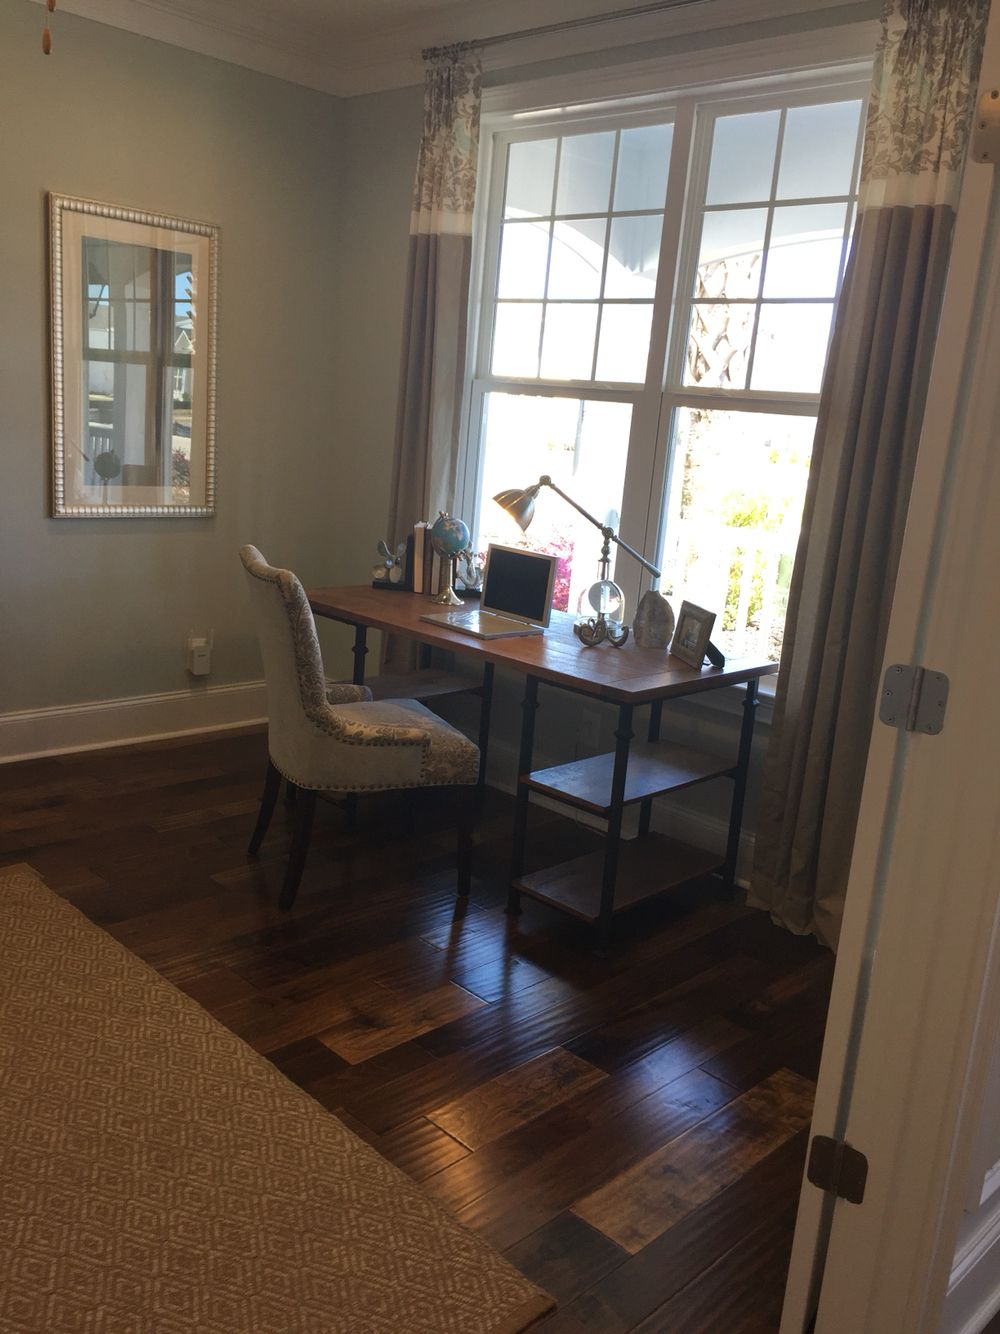 Condominium Study Room: Front Room, Home Decor, Home